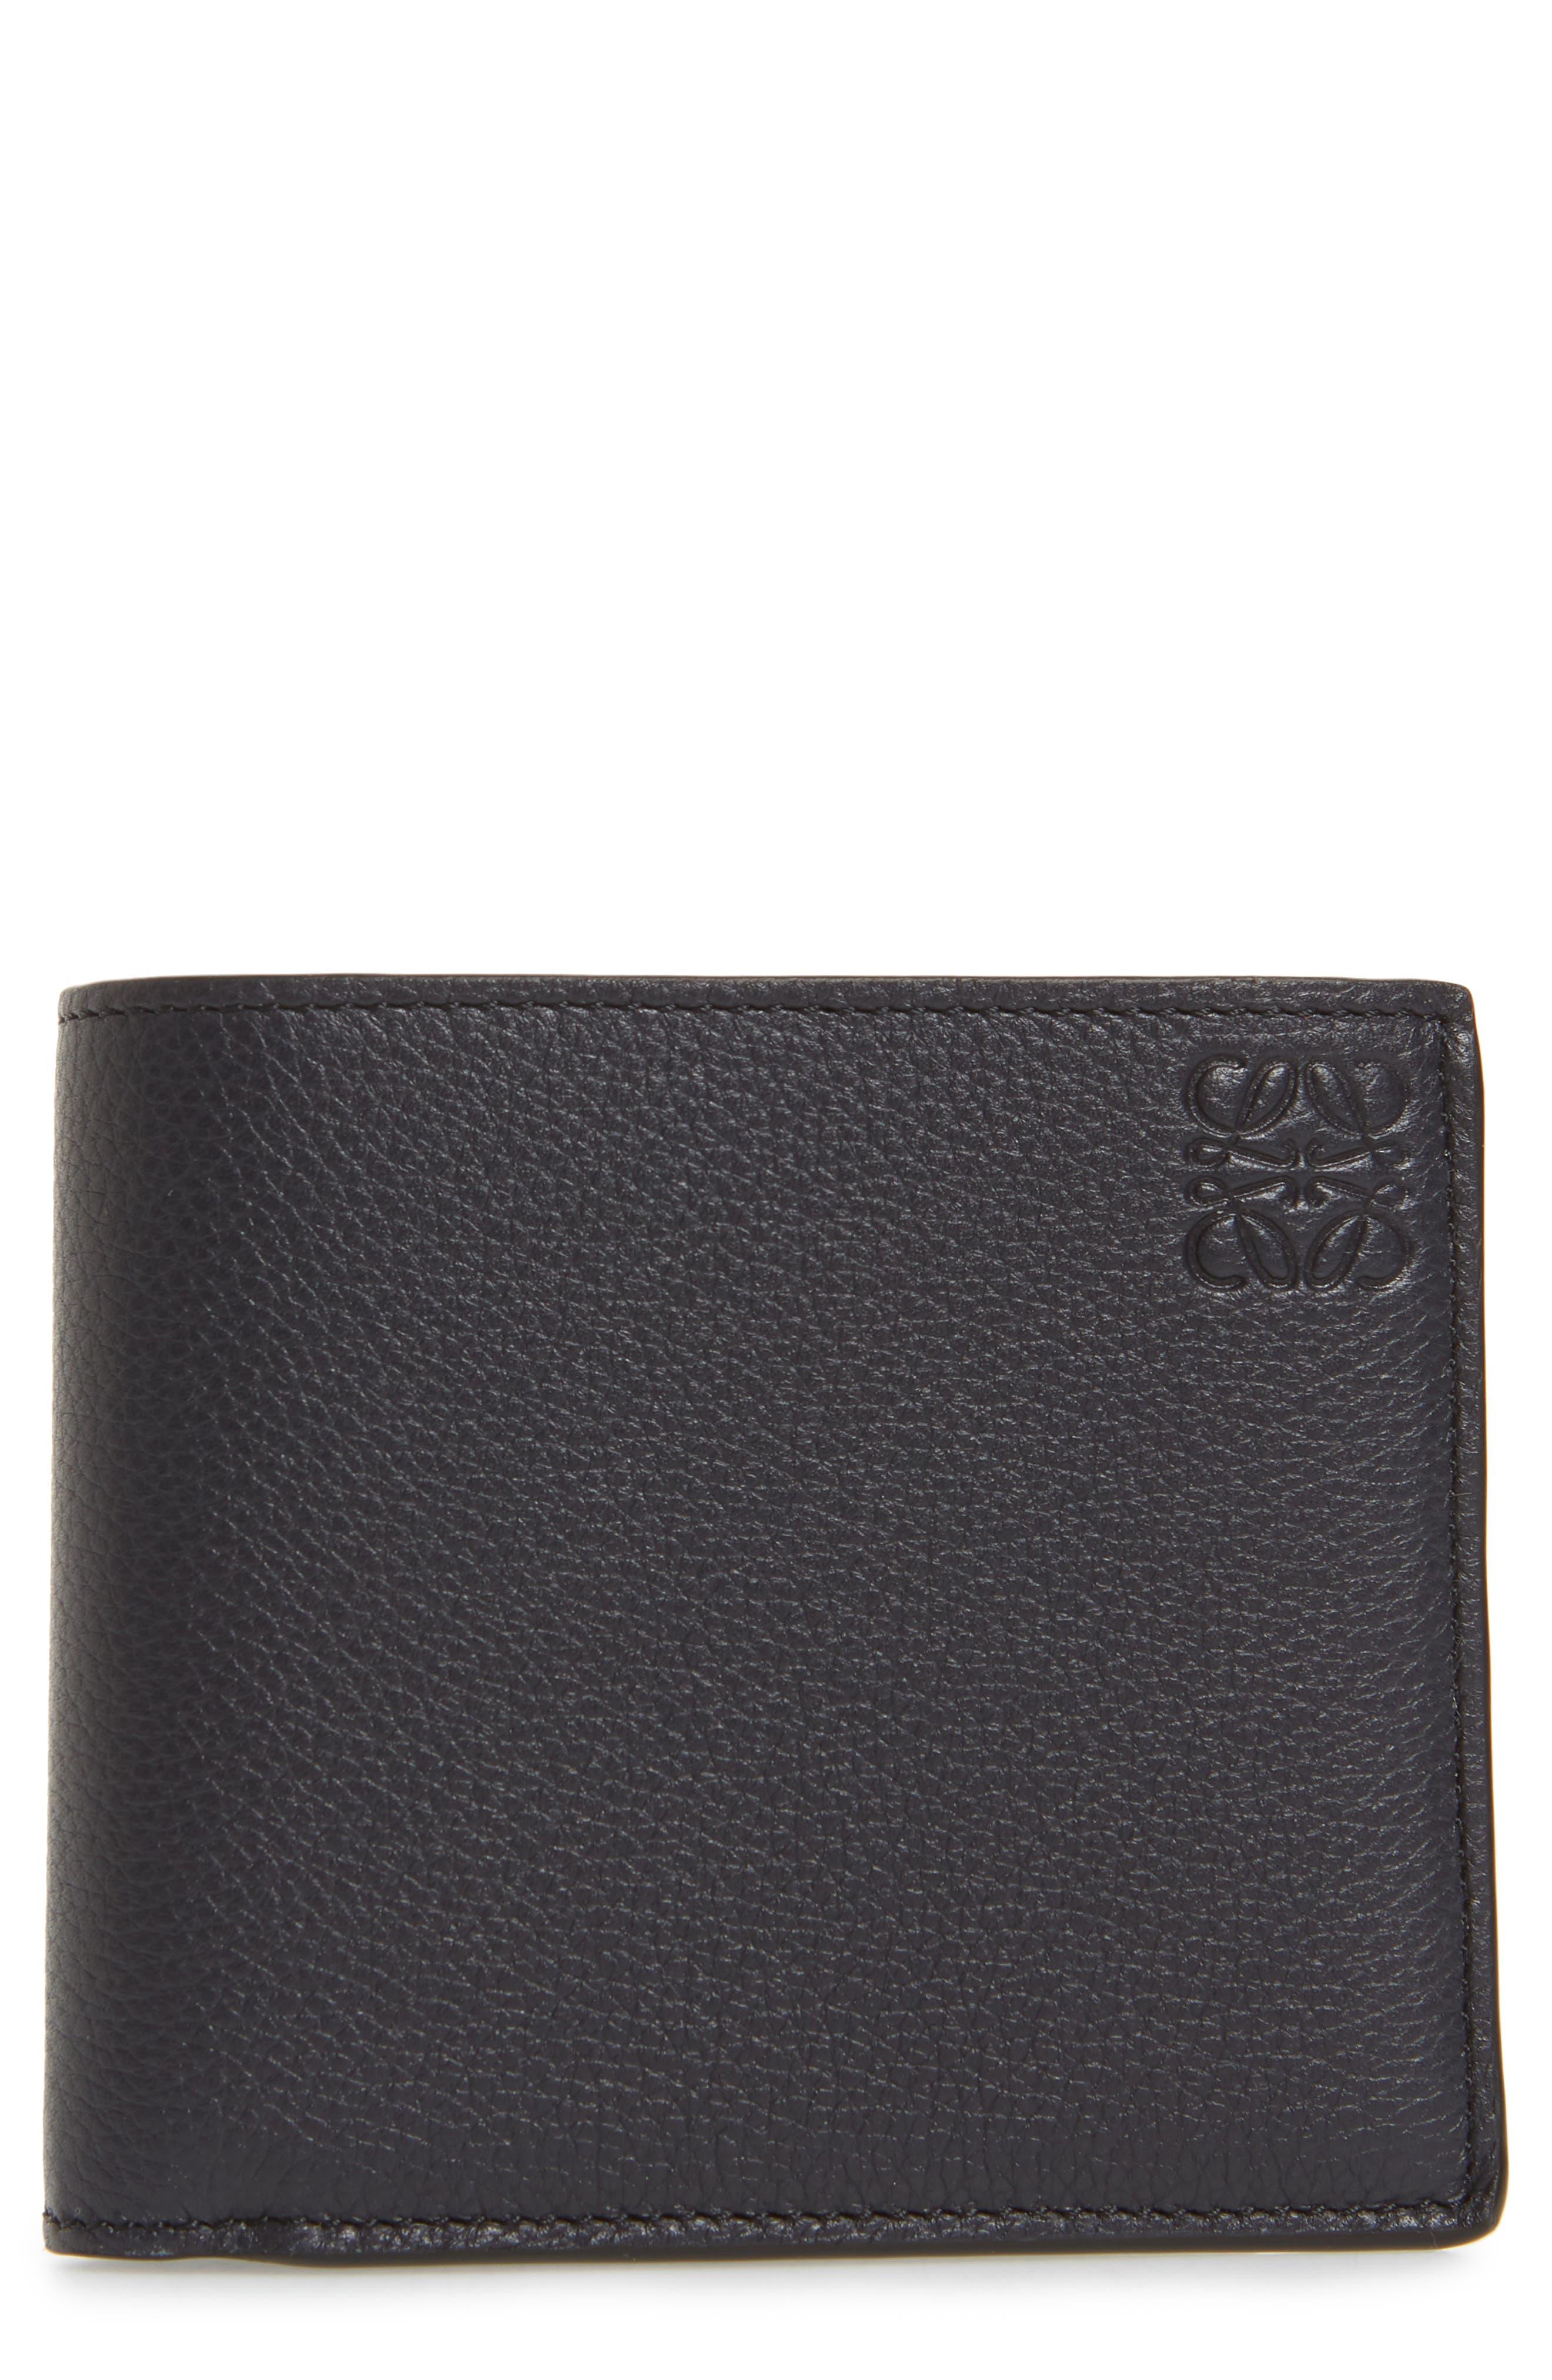 LOEWE Calfskin Leather Bifold Wallet, Main, color, MIDNIGHT